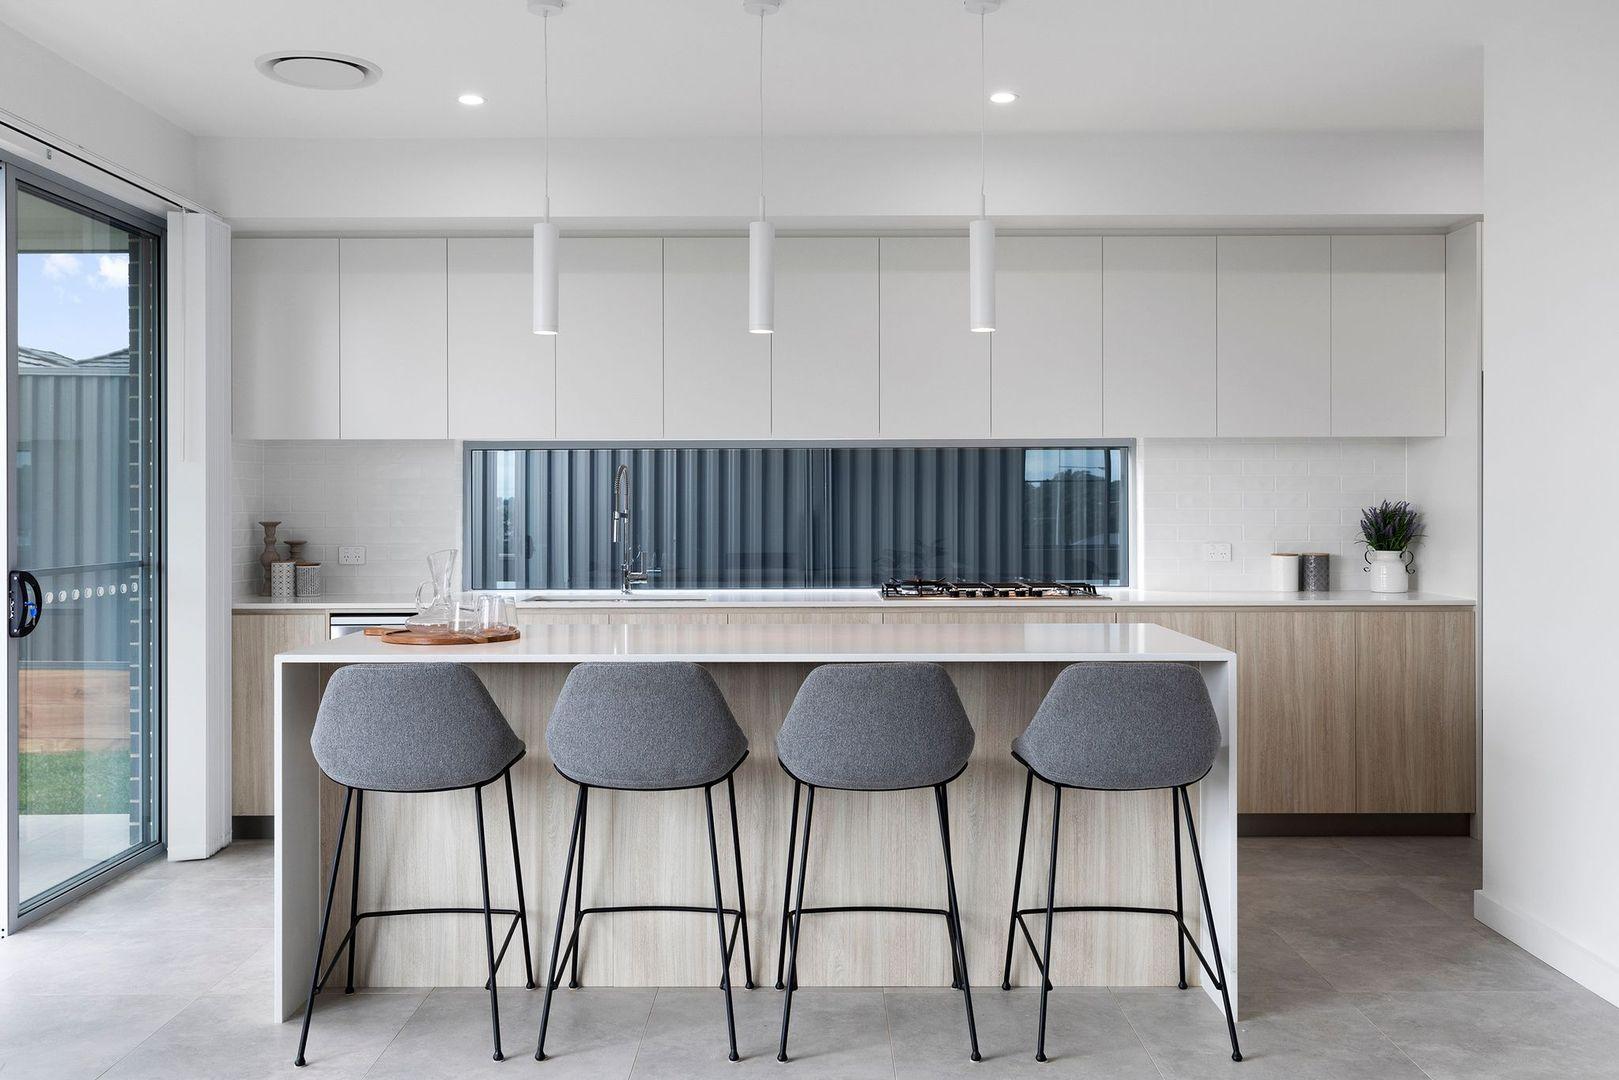 197 Dalmatia Ave,, Edmondson Park NSW 2174, Image 1